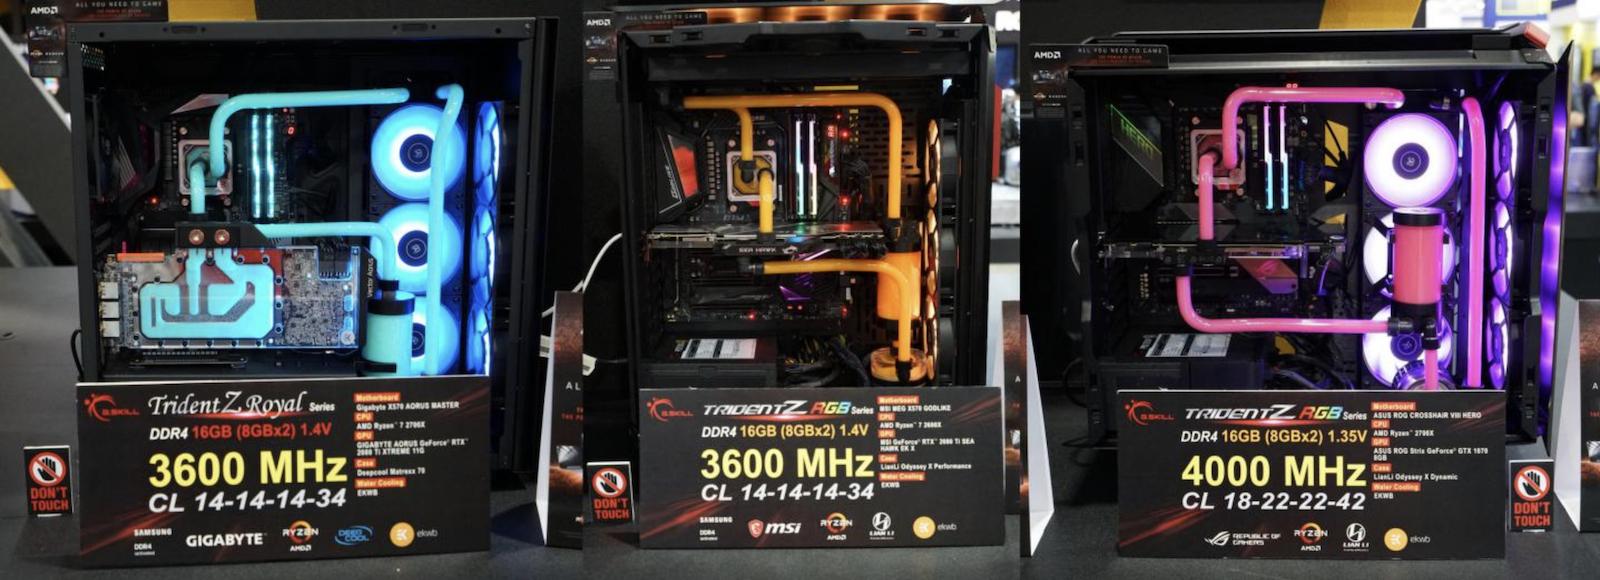 G.SKILL Showcases Extreme DDR4 at Computex - Memory 2